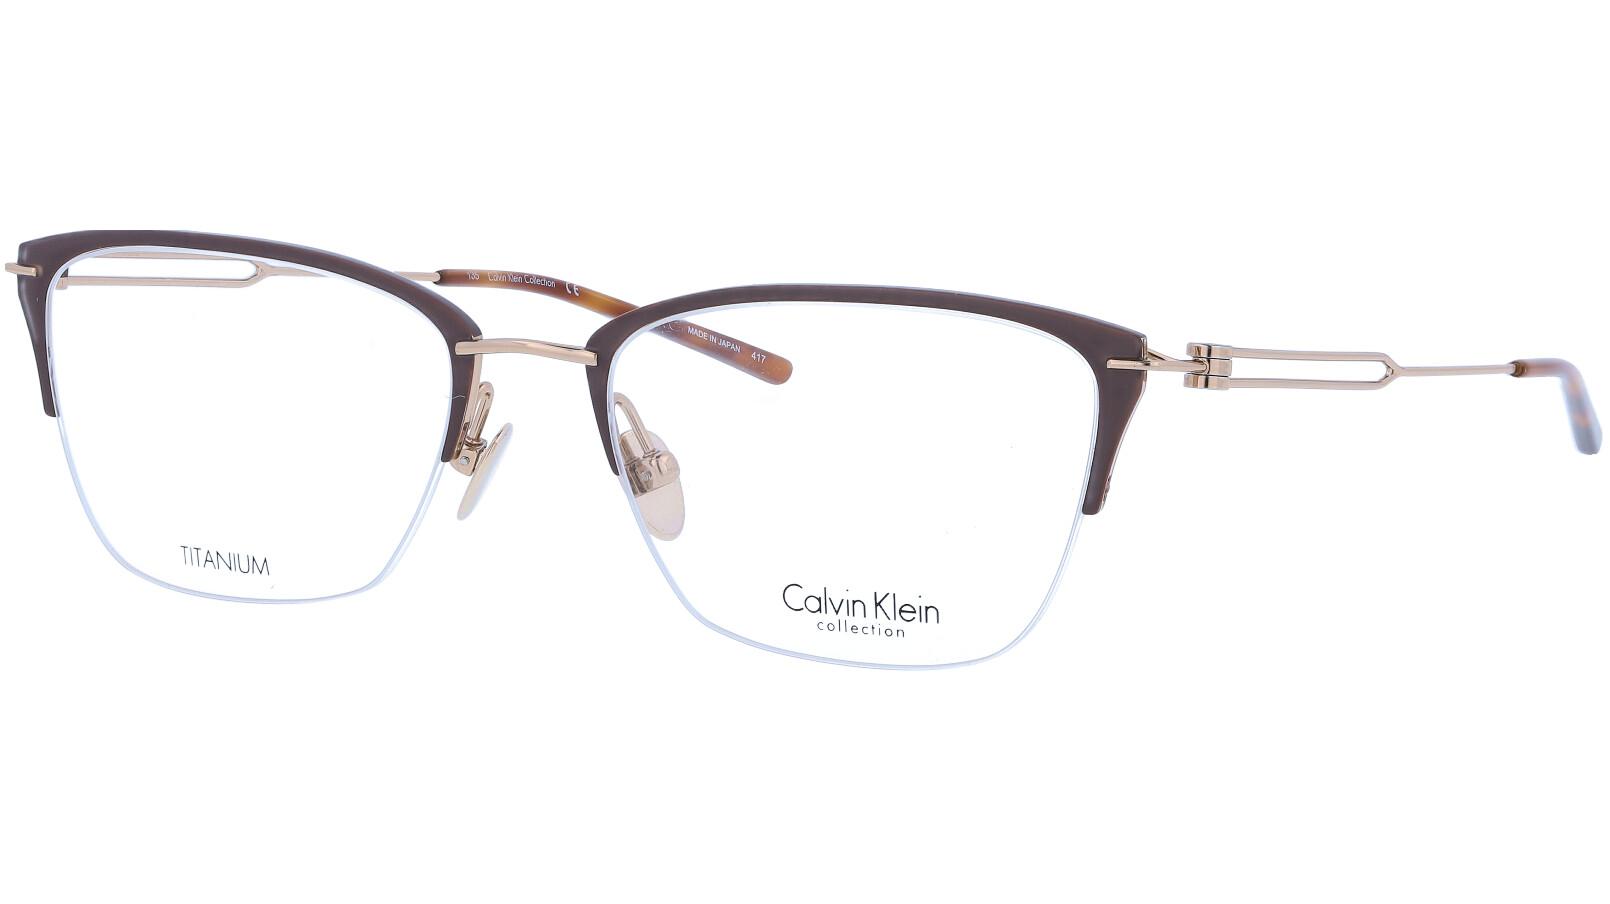 CALVIN KLEIN CK8065 223 52 BROWN Glasses